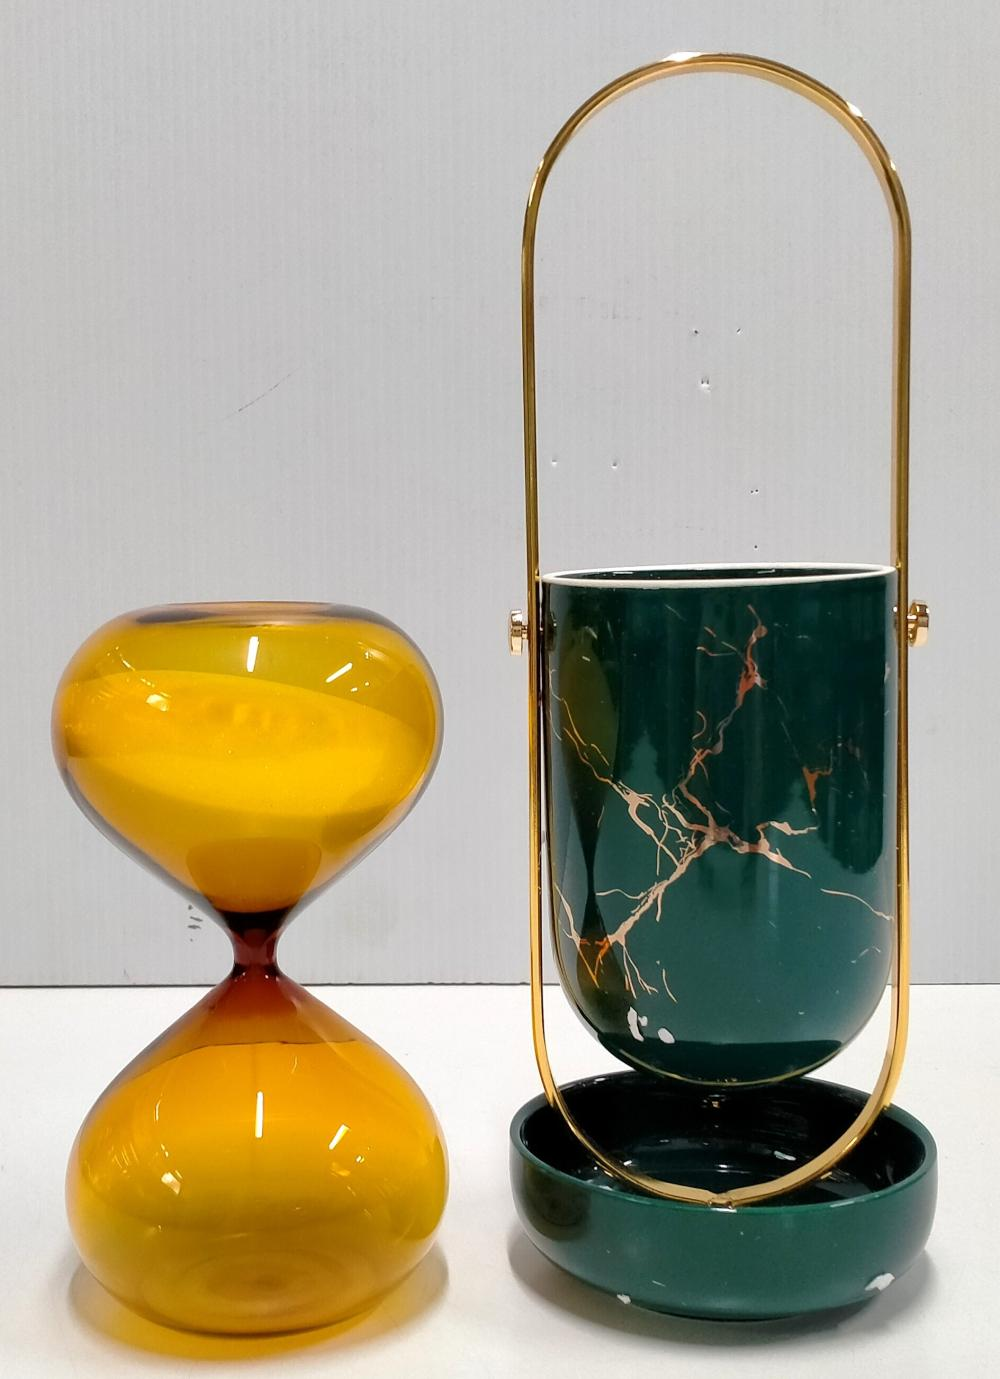 A ceramic utensil holder plus 30 minute sandglass